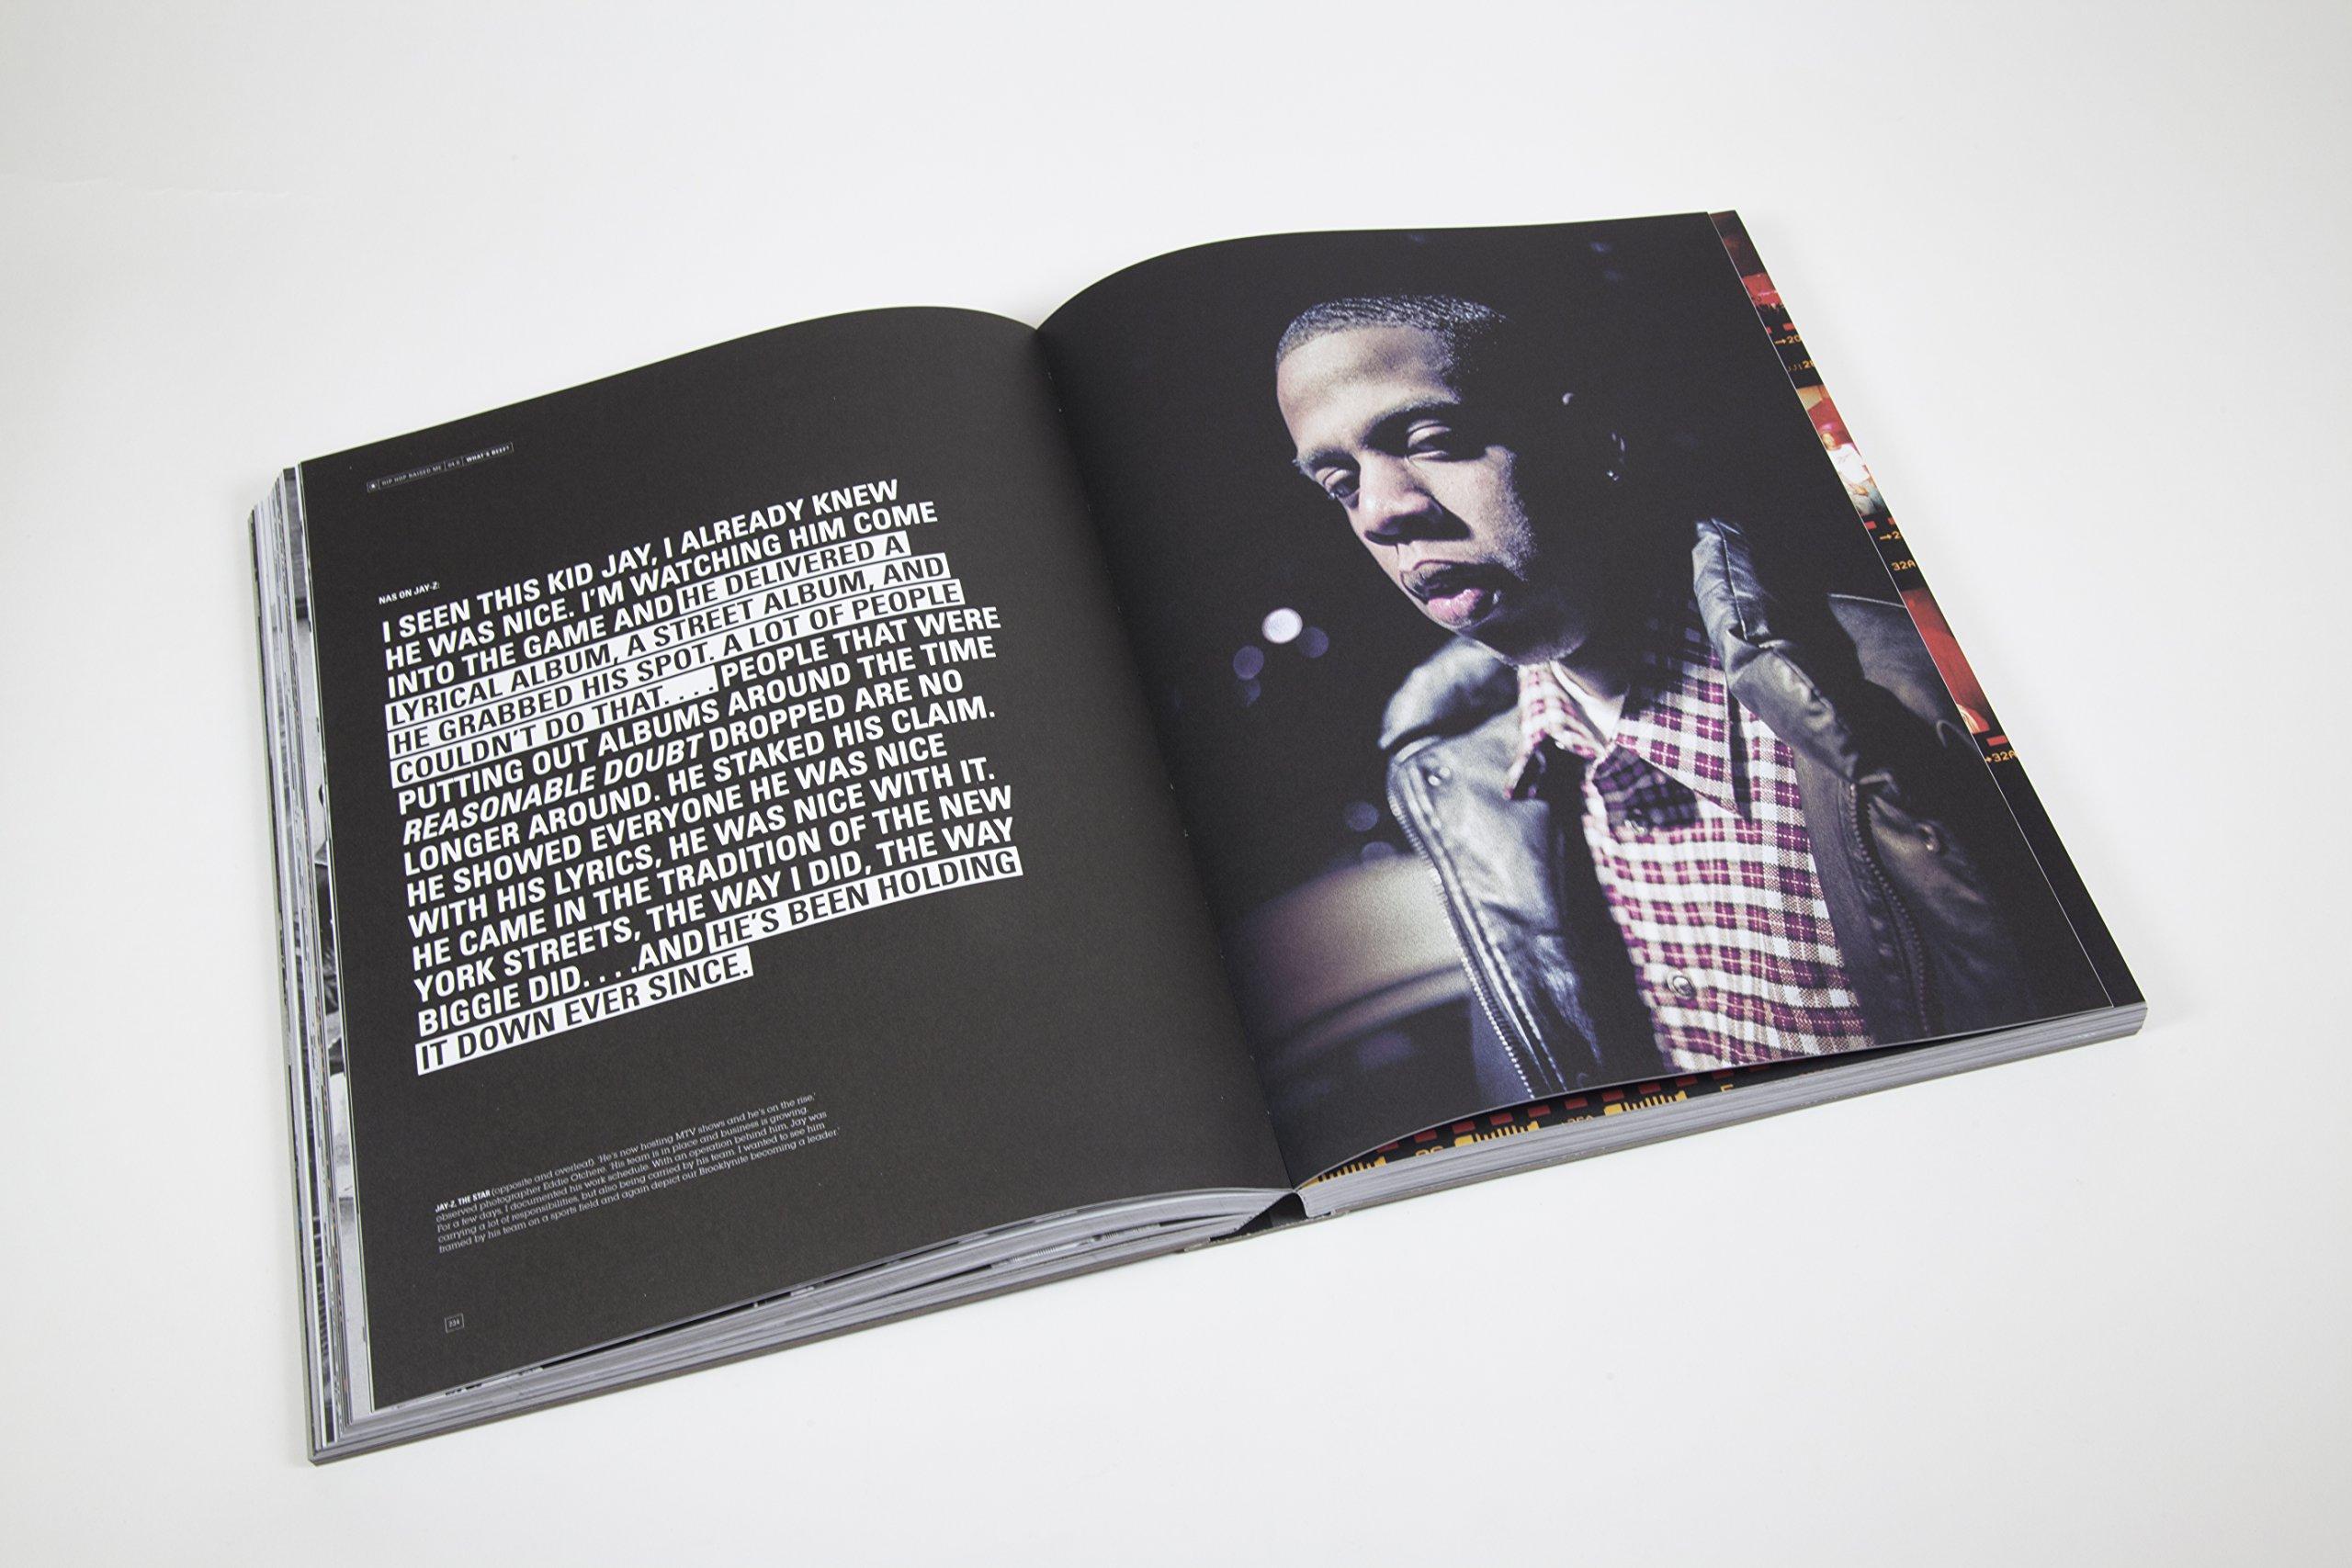 Amazon.com: Hip Hop Raised Me (9780500518946): DJ Semtex: Books